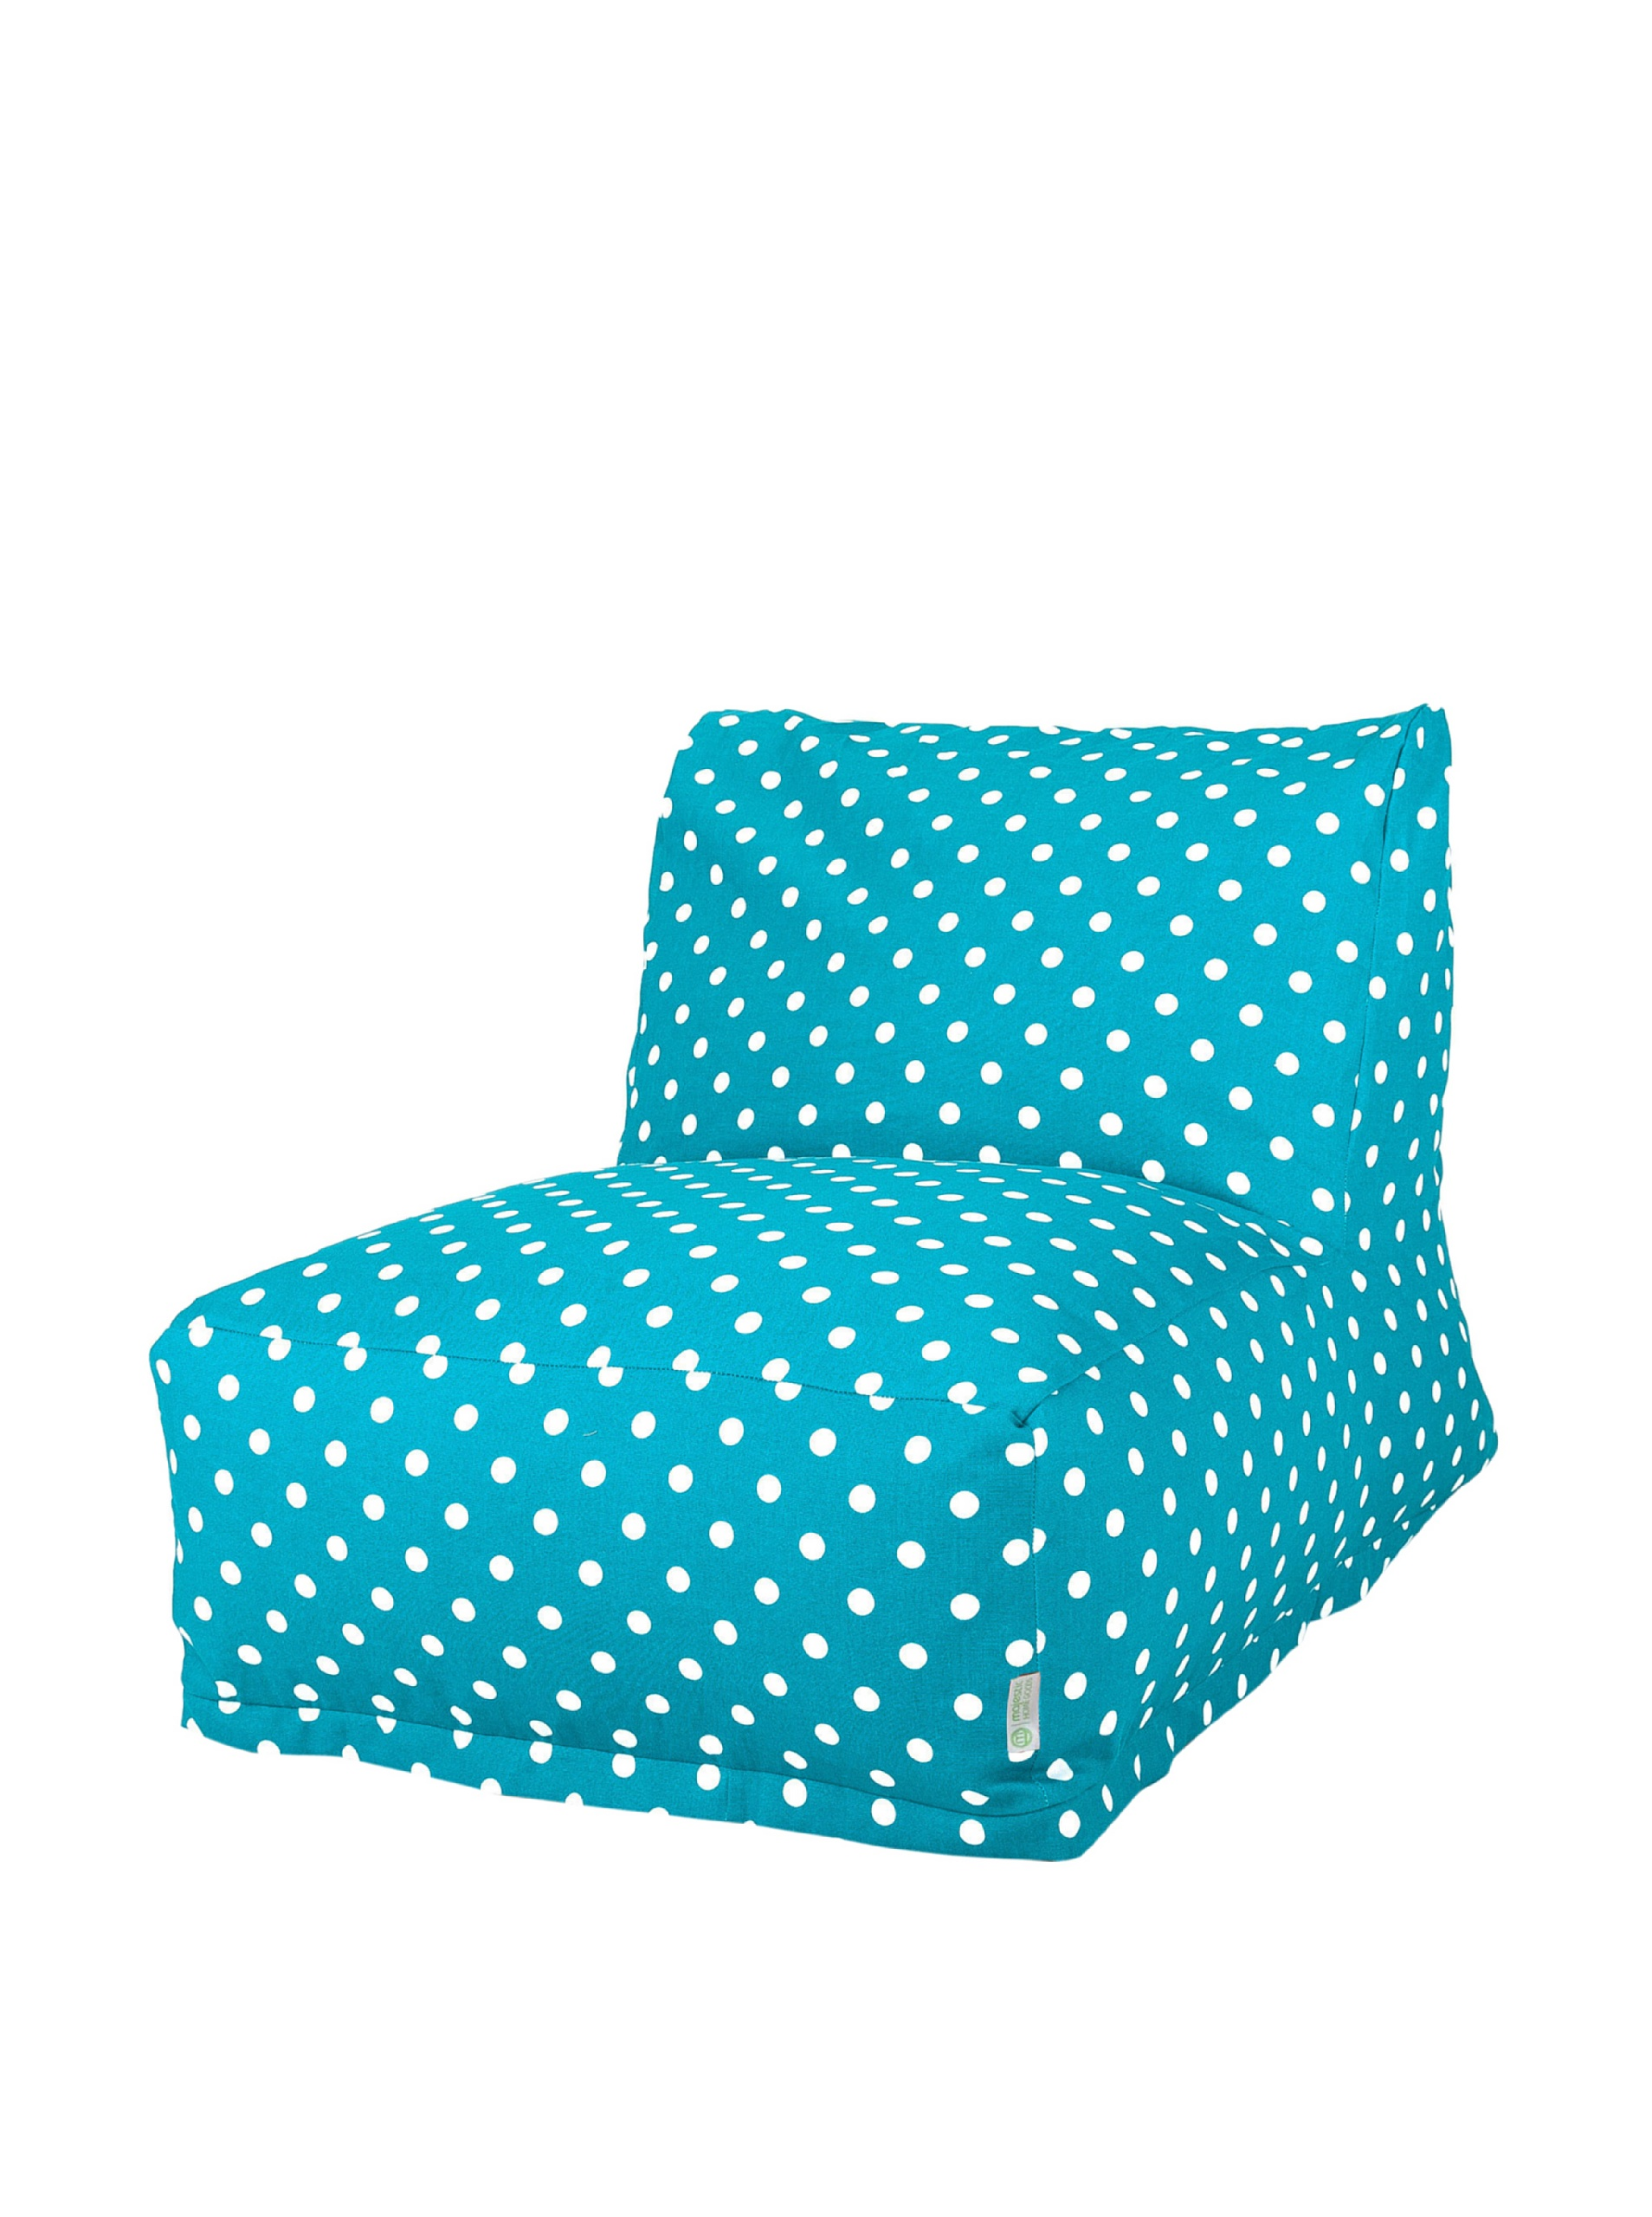 Majestic Home Goods Polka Dot Bean Bag Chair Lounger, Small, Blue